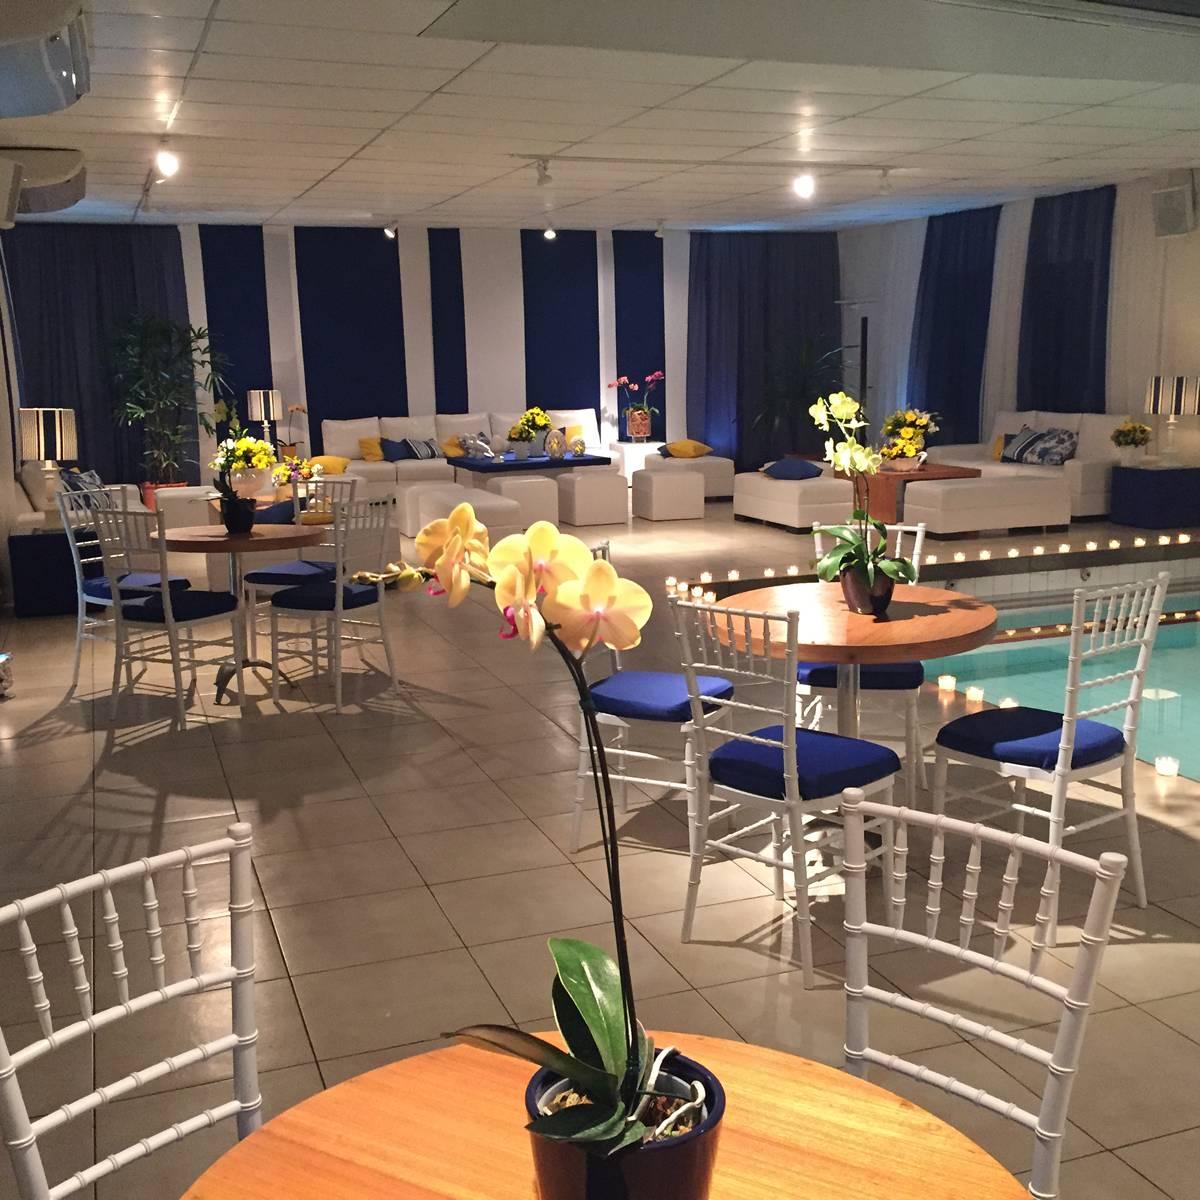 decoracao-club-lounge-casamento-festa.jpg